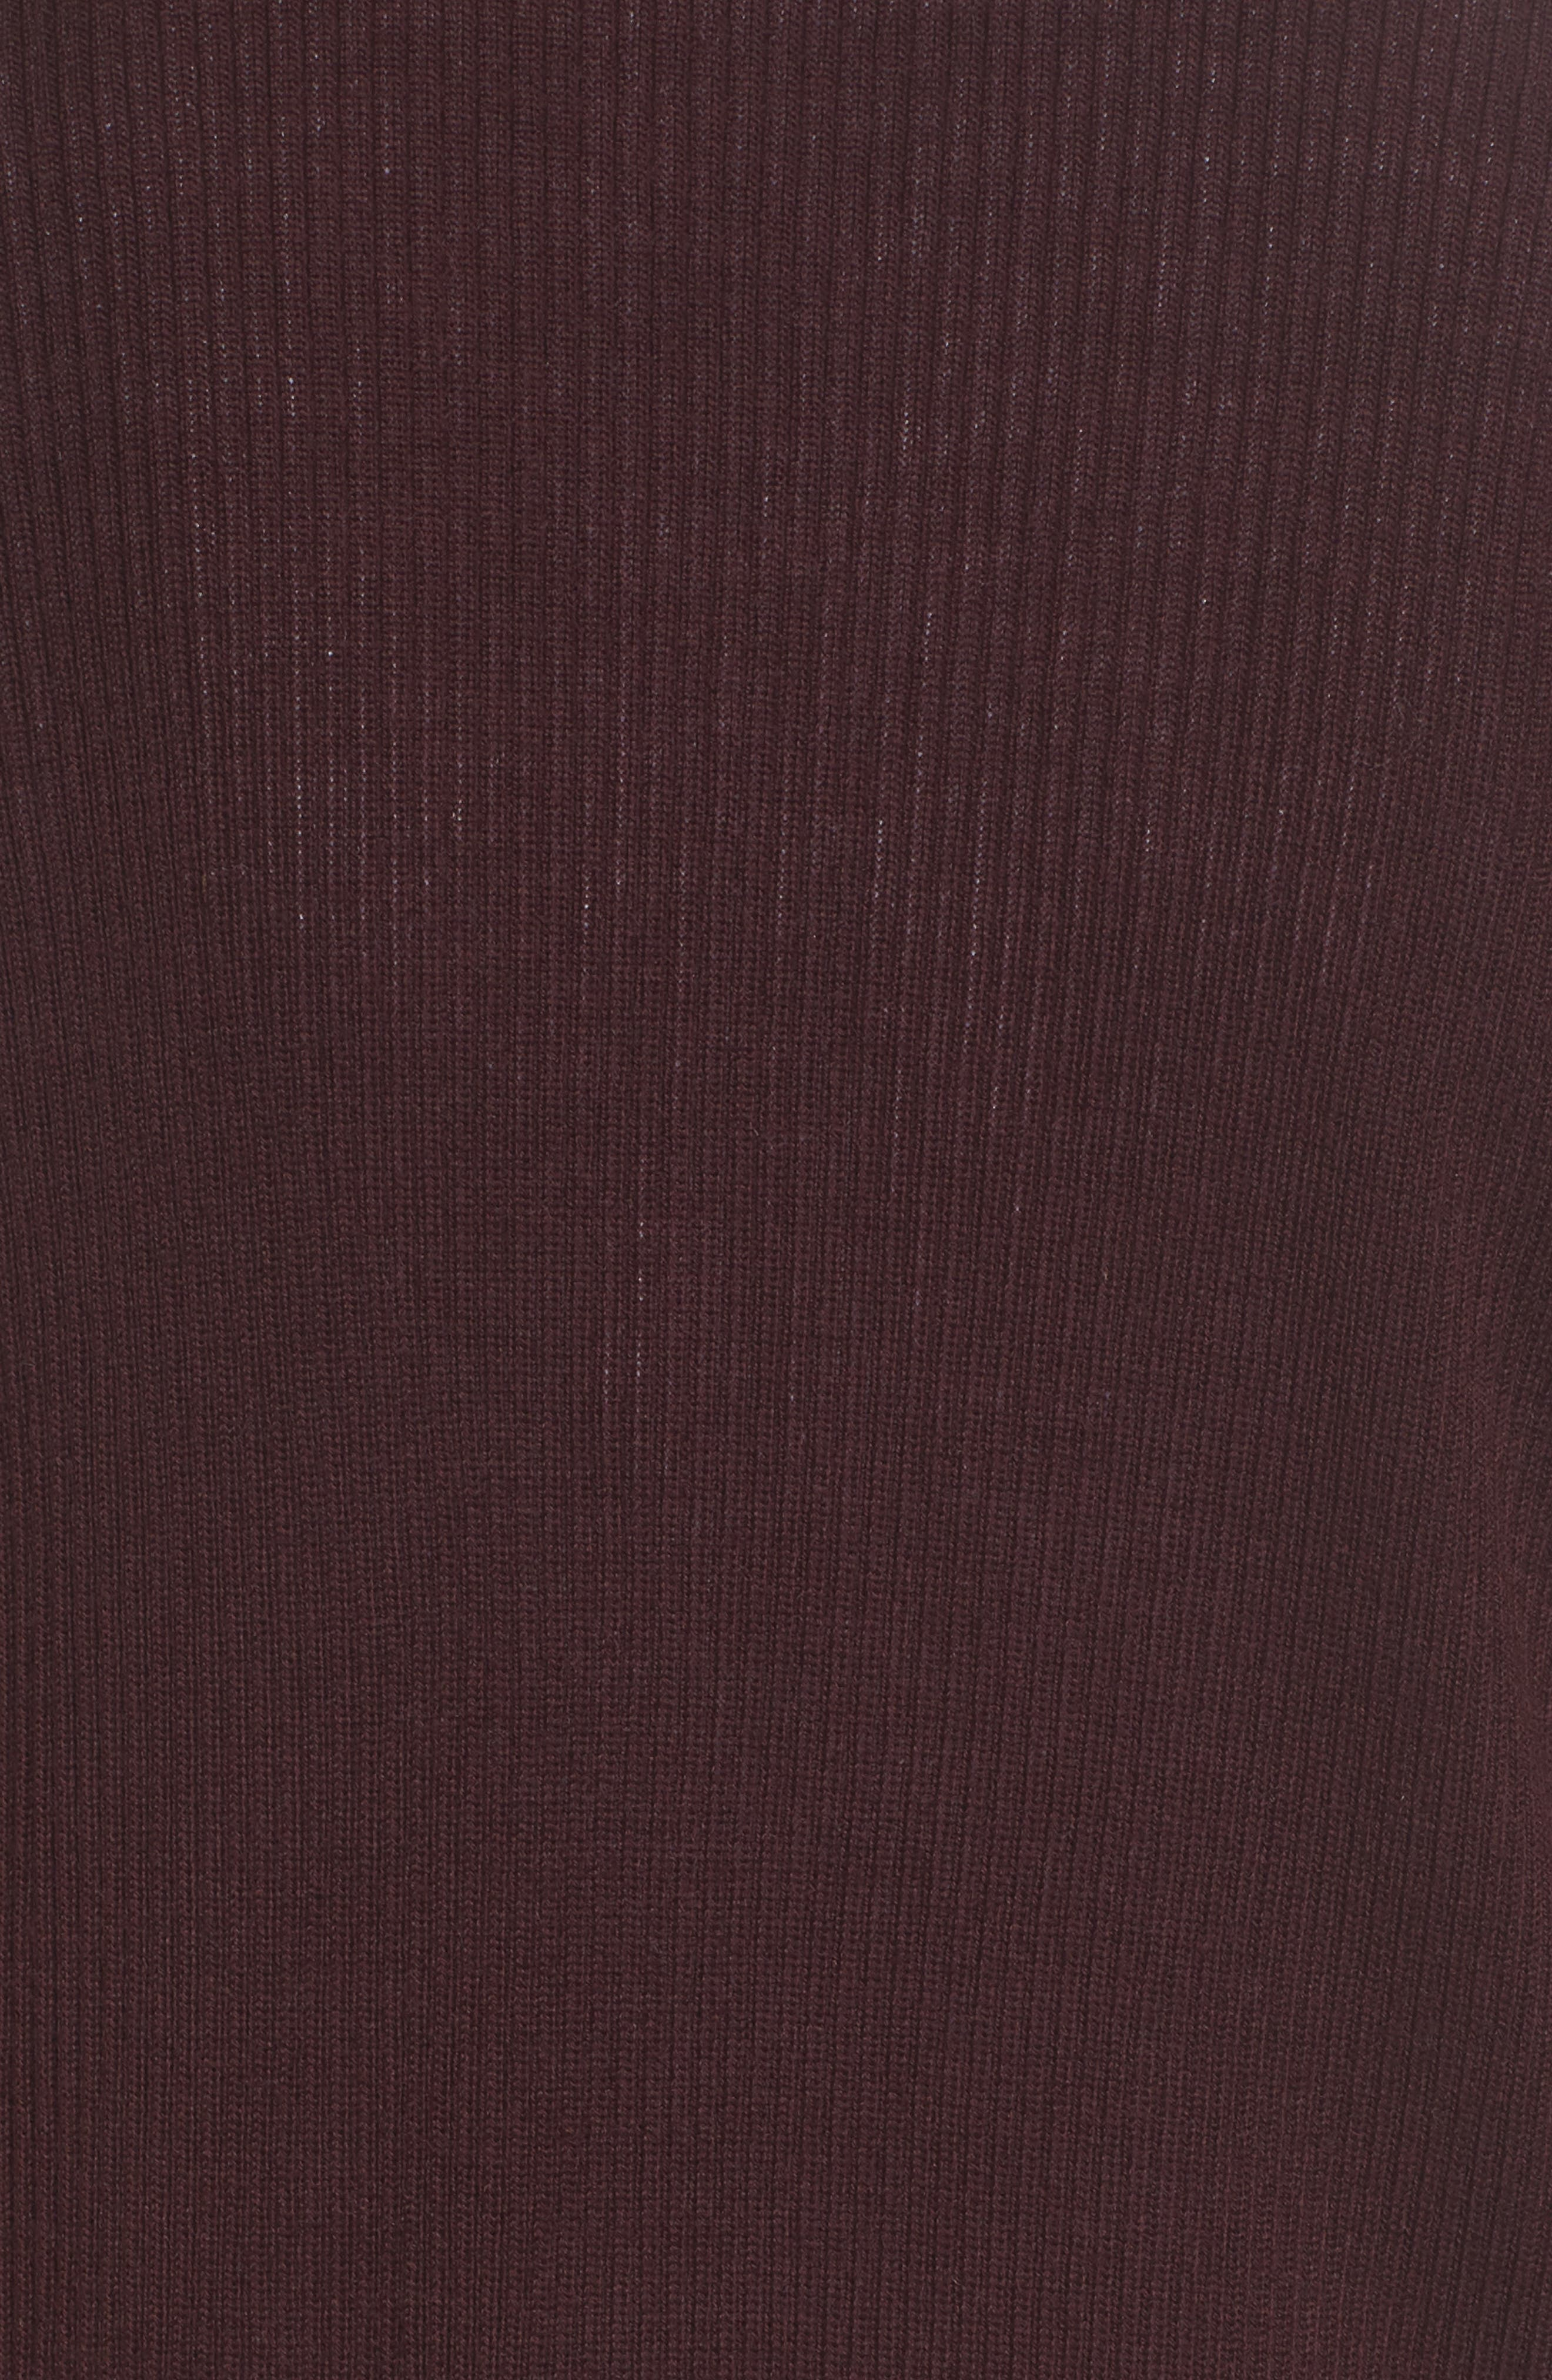 Rib Knit Wool Blend Cardigan,                             Alternate thumbnail 101, color,